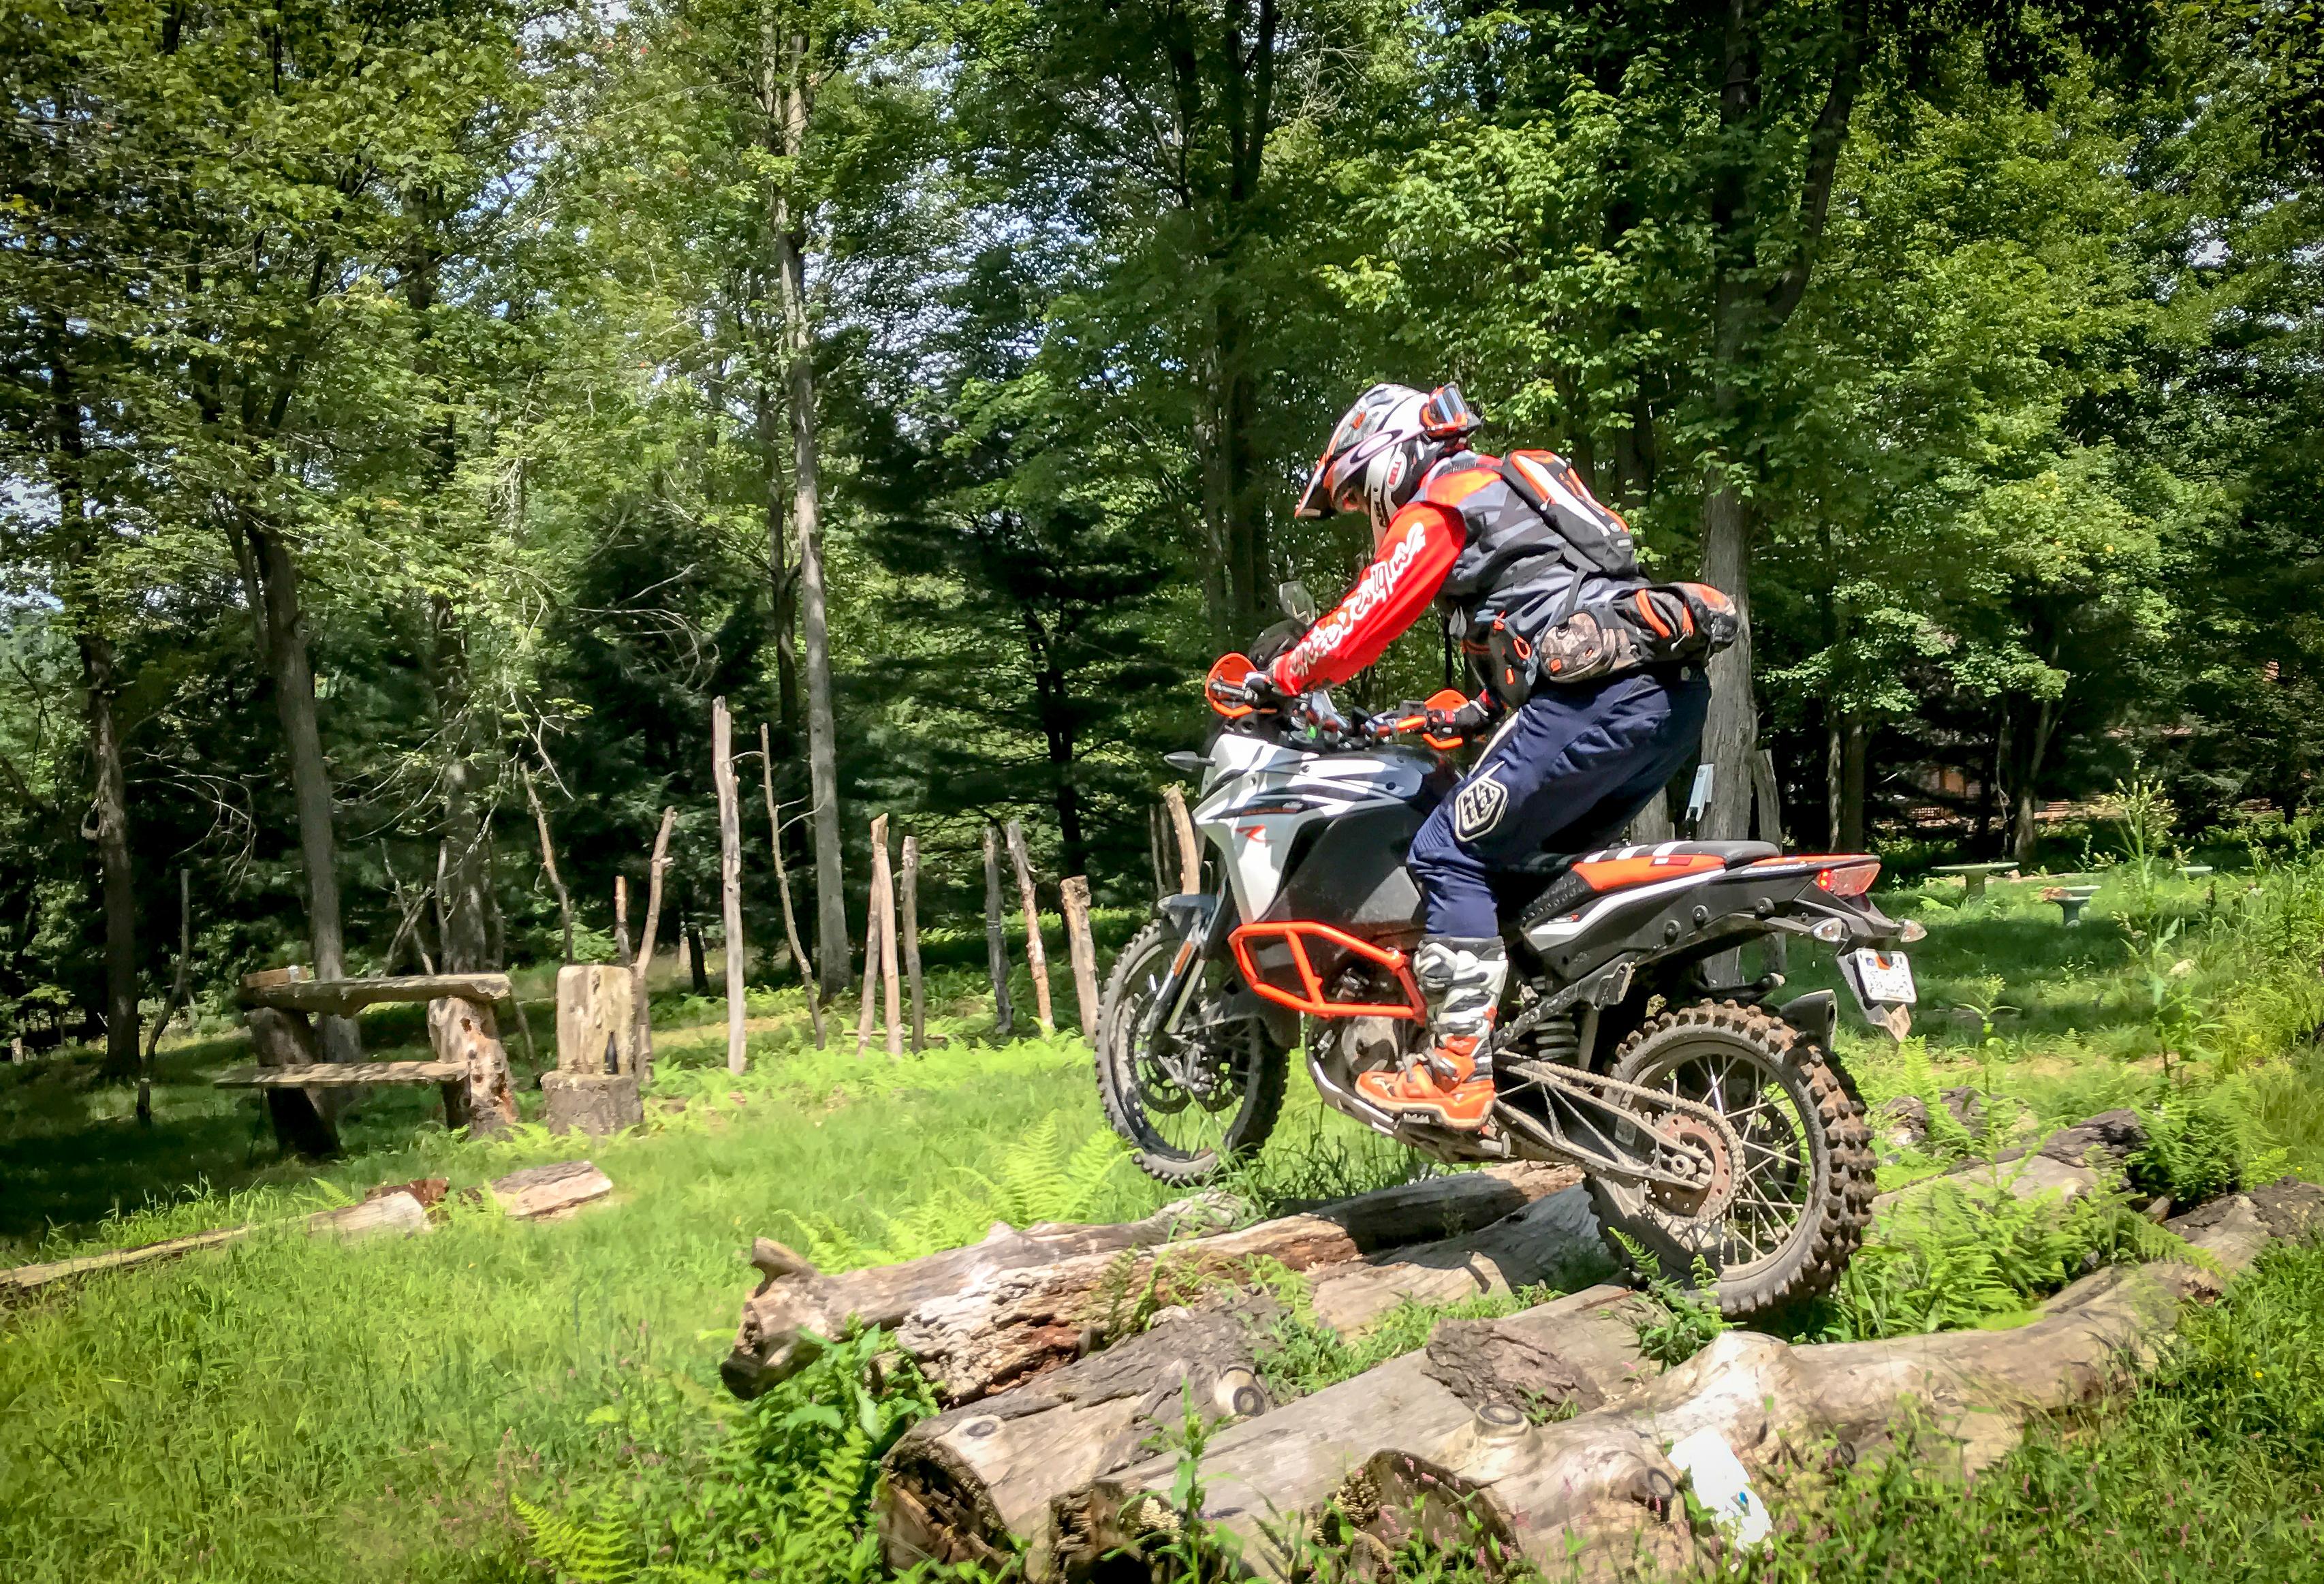 Revzilla VsOff Adventure Motorcycle To Choose GearHow Road mwnON0v8